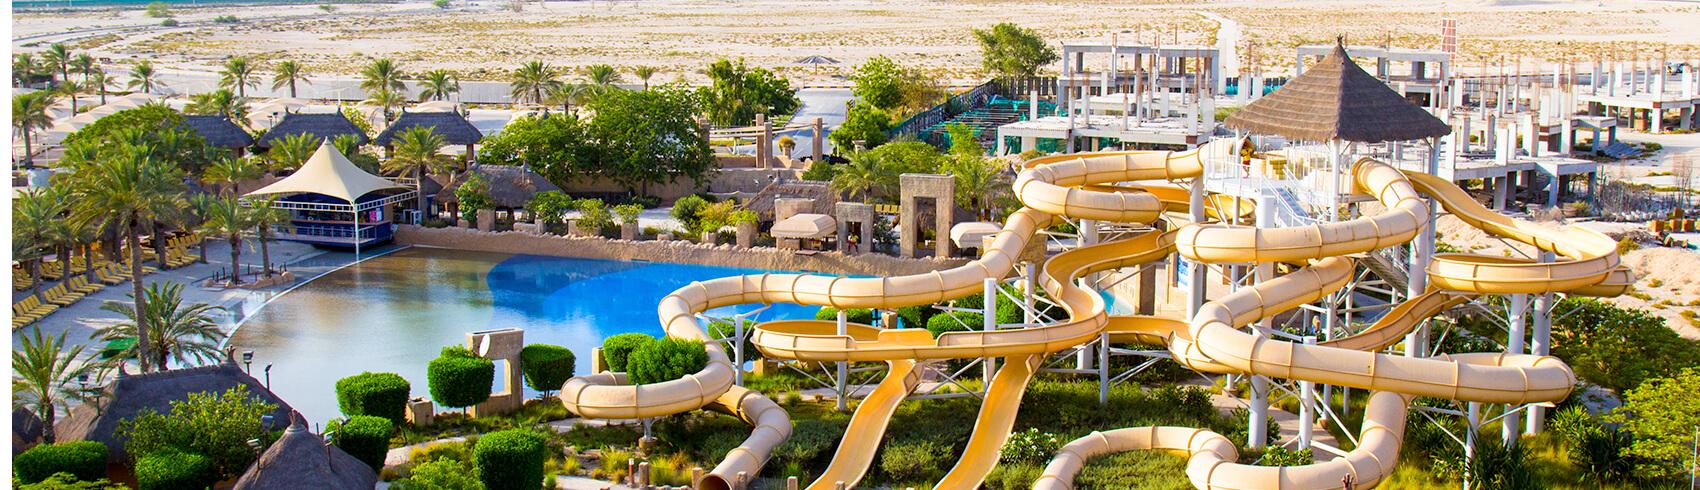 Lost Paradise Water Park Bahrain